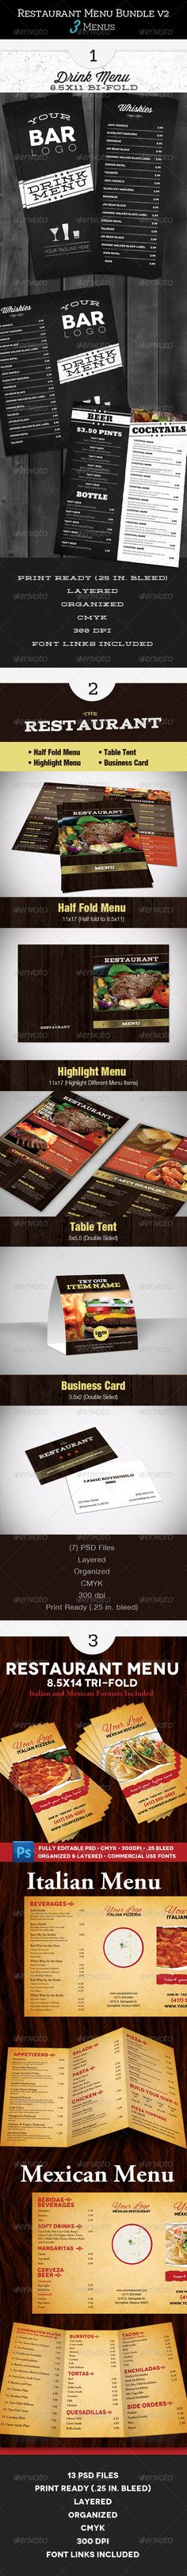 Japanese Restaurant Brochure Trifold Brochures and Restaurant - restarunt brochure